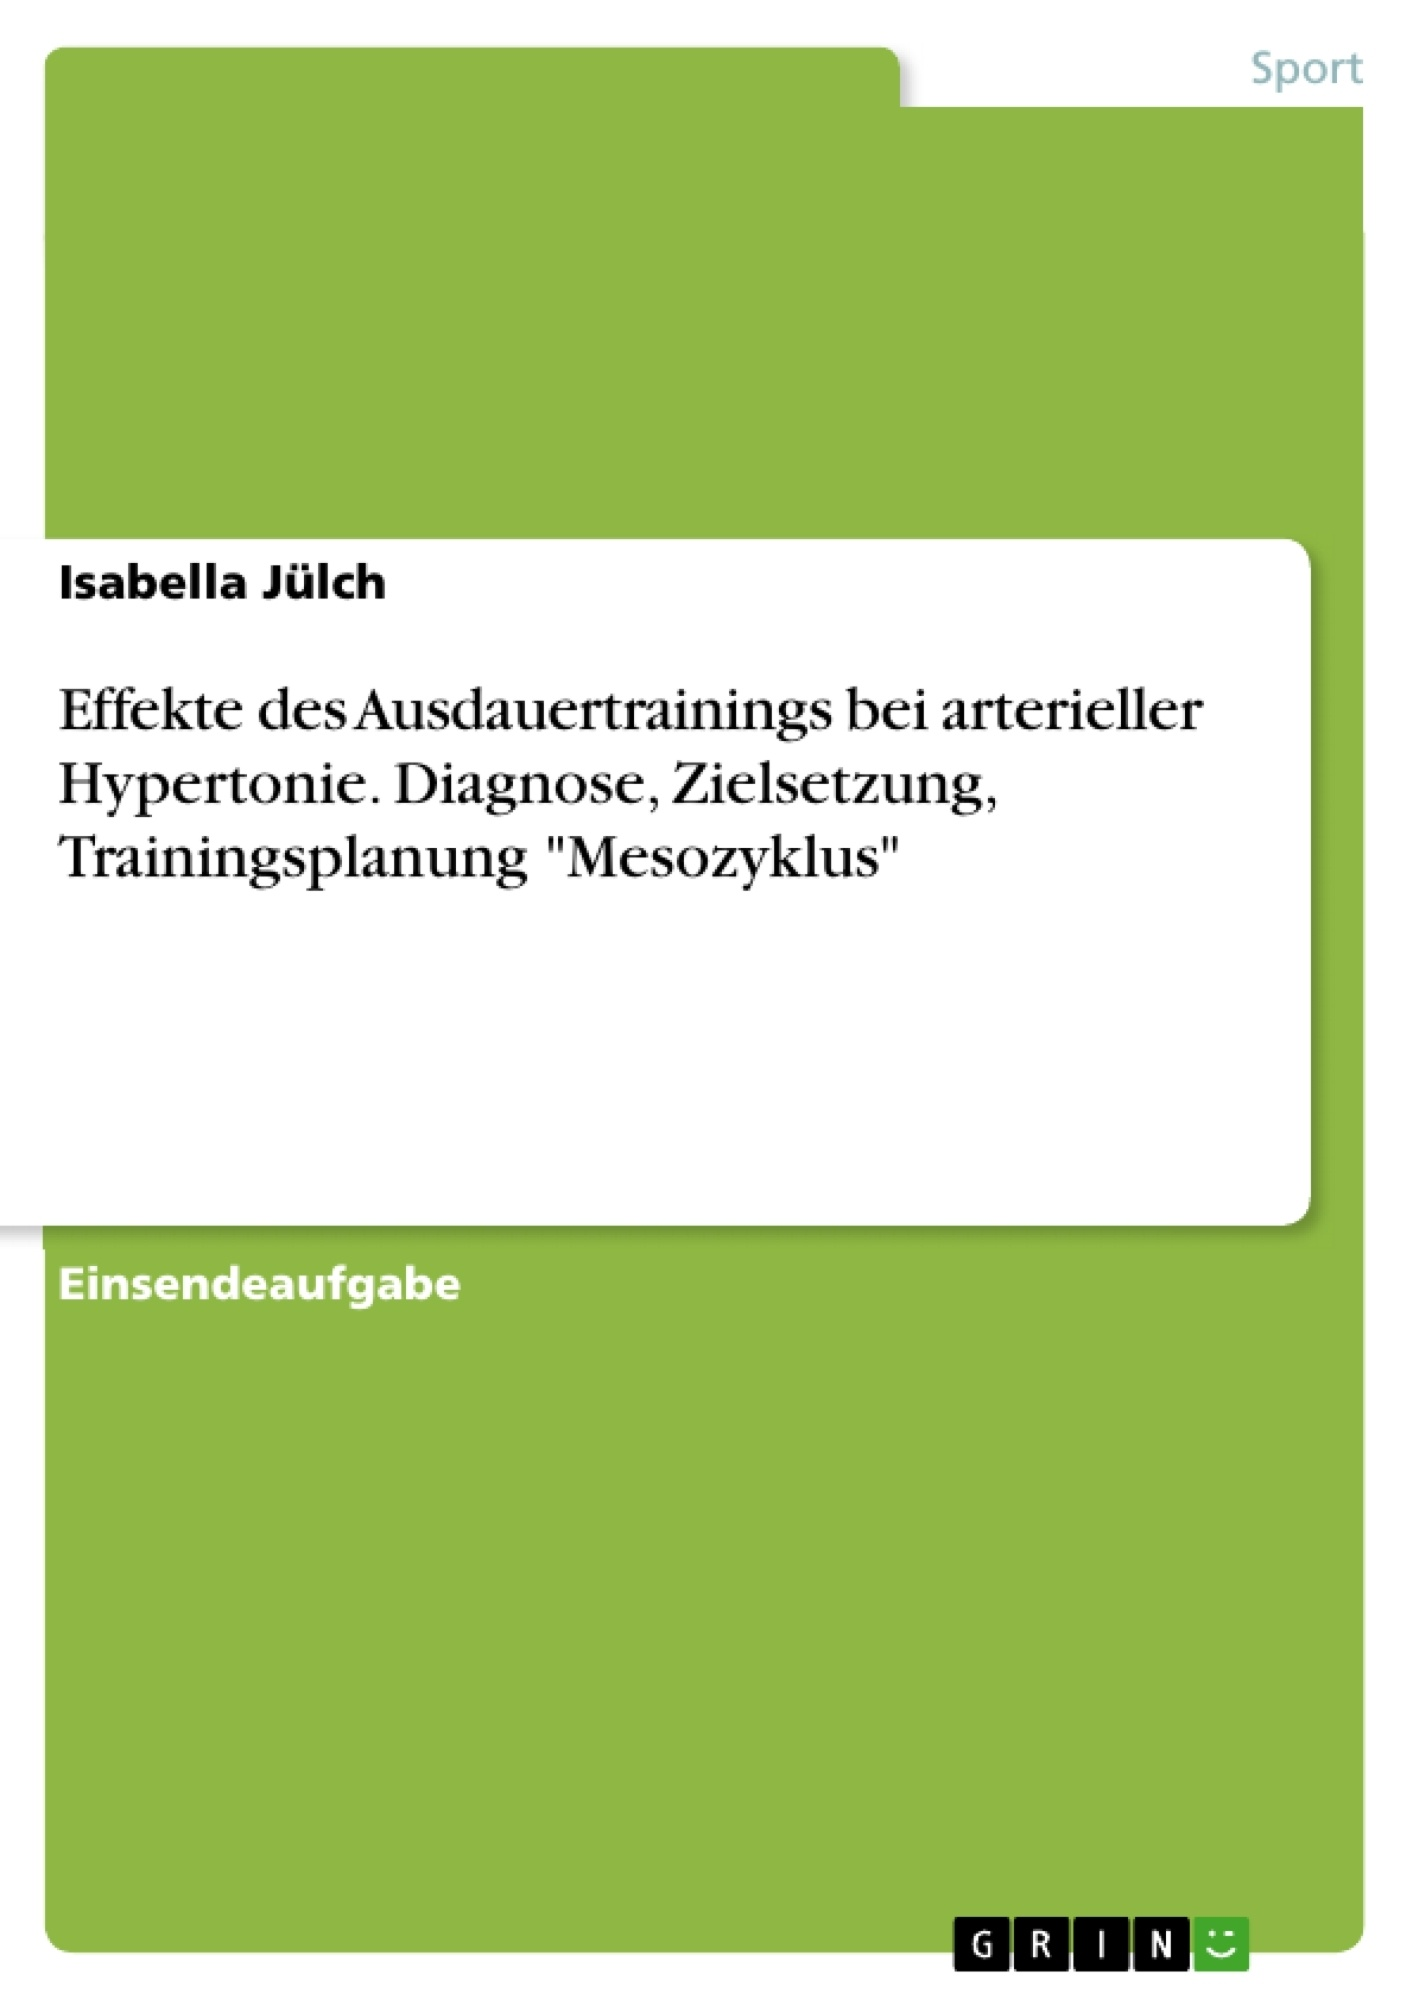 "Titel: Effekte des Ausdauertrainings bei arterieller Hypertonie. Diagnose, Zielsetzung, Trainingsplanung ""Mesozyklus"""